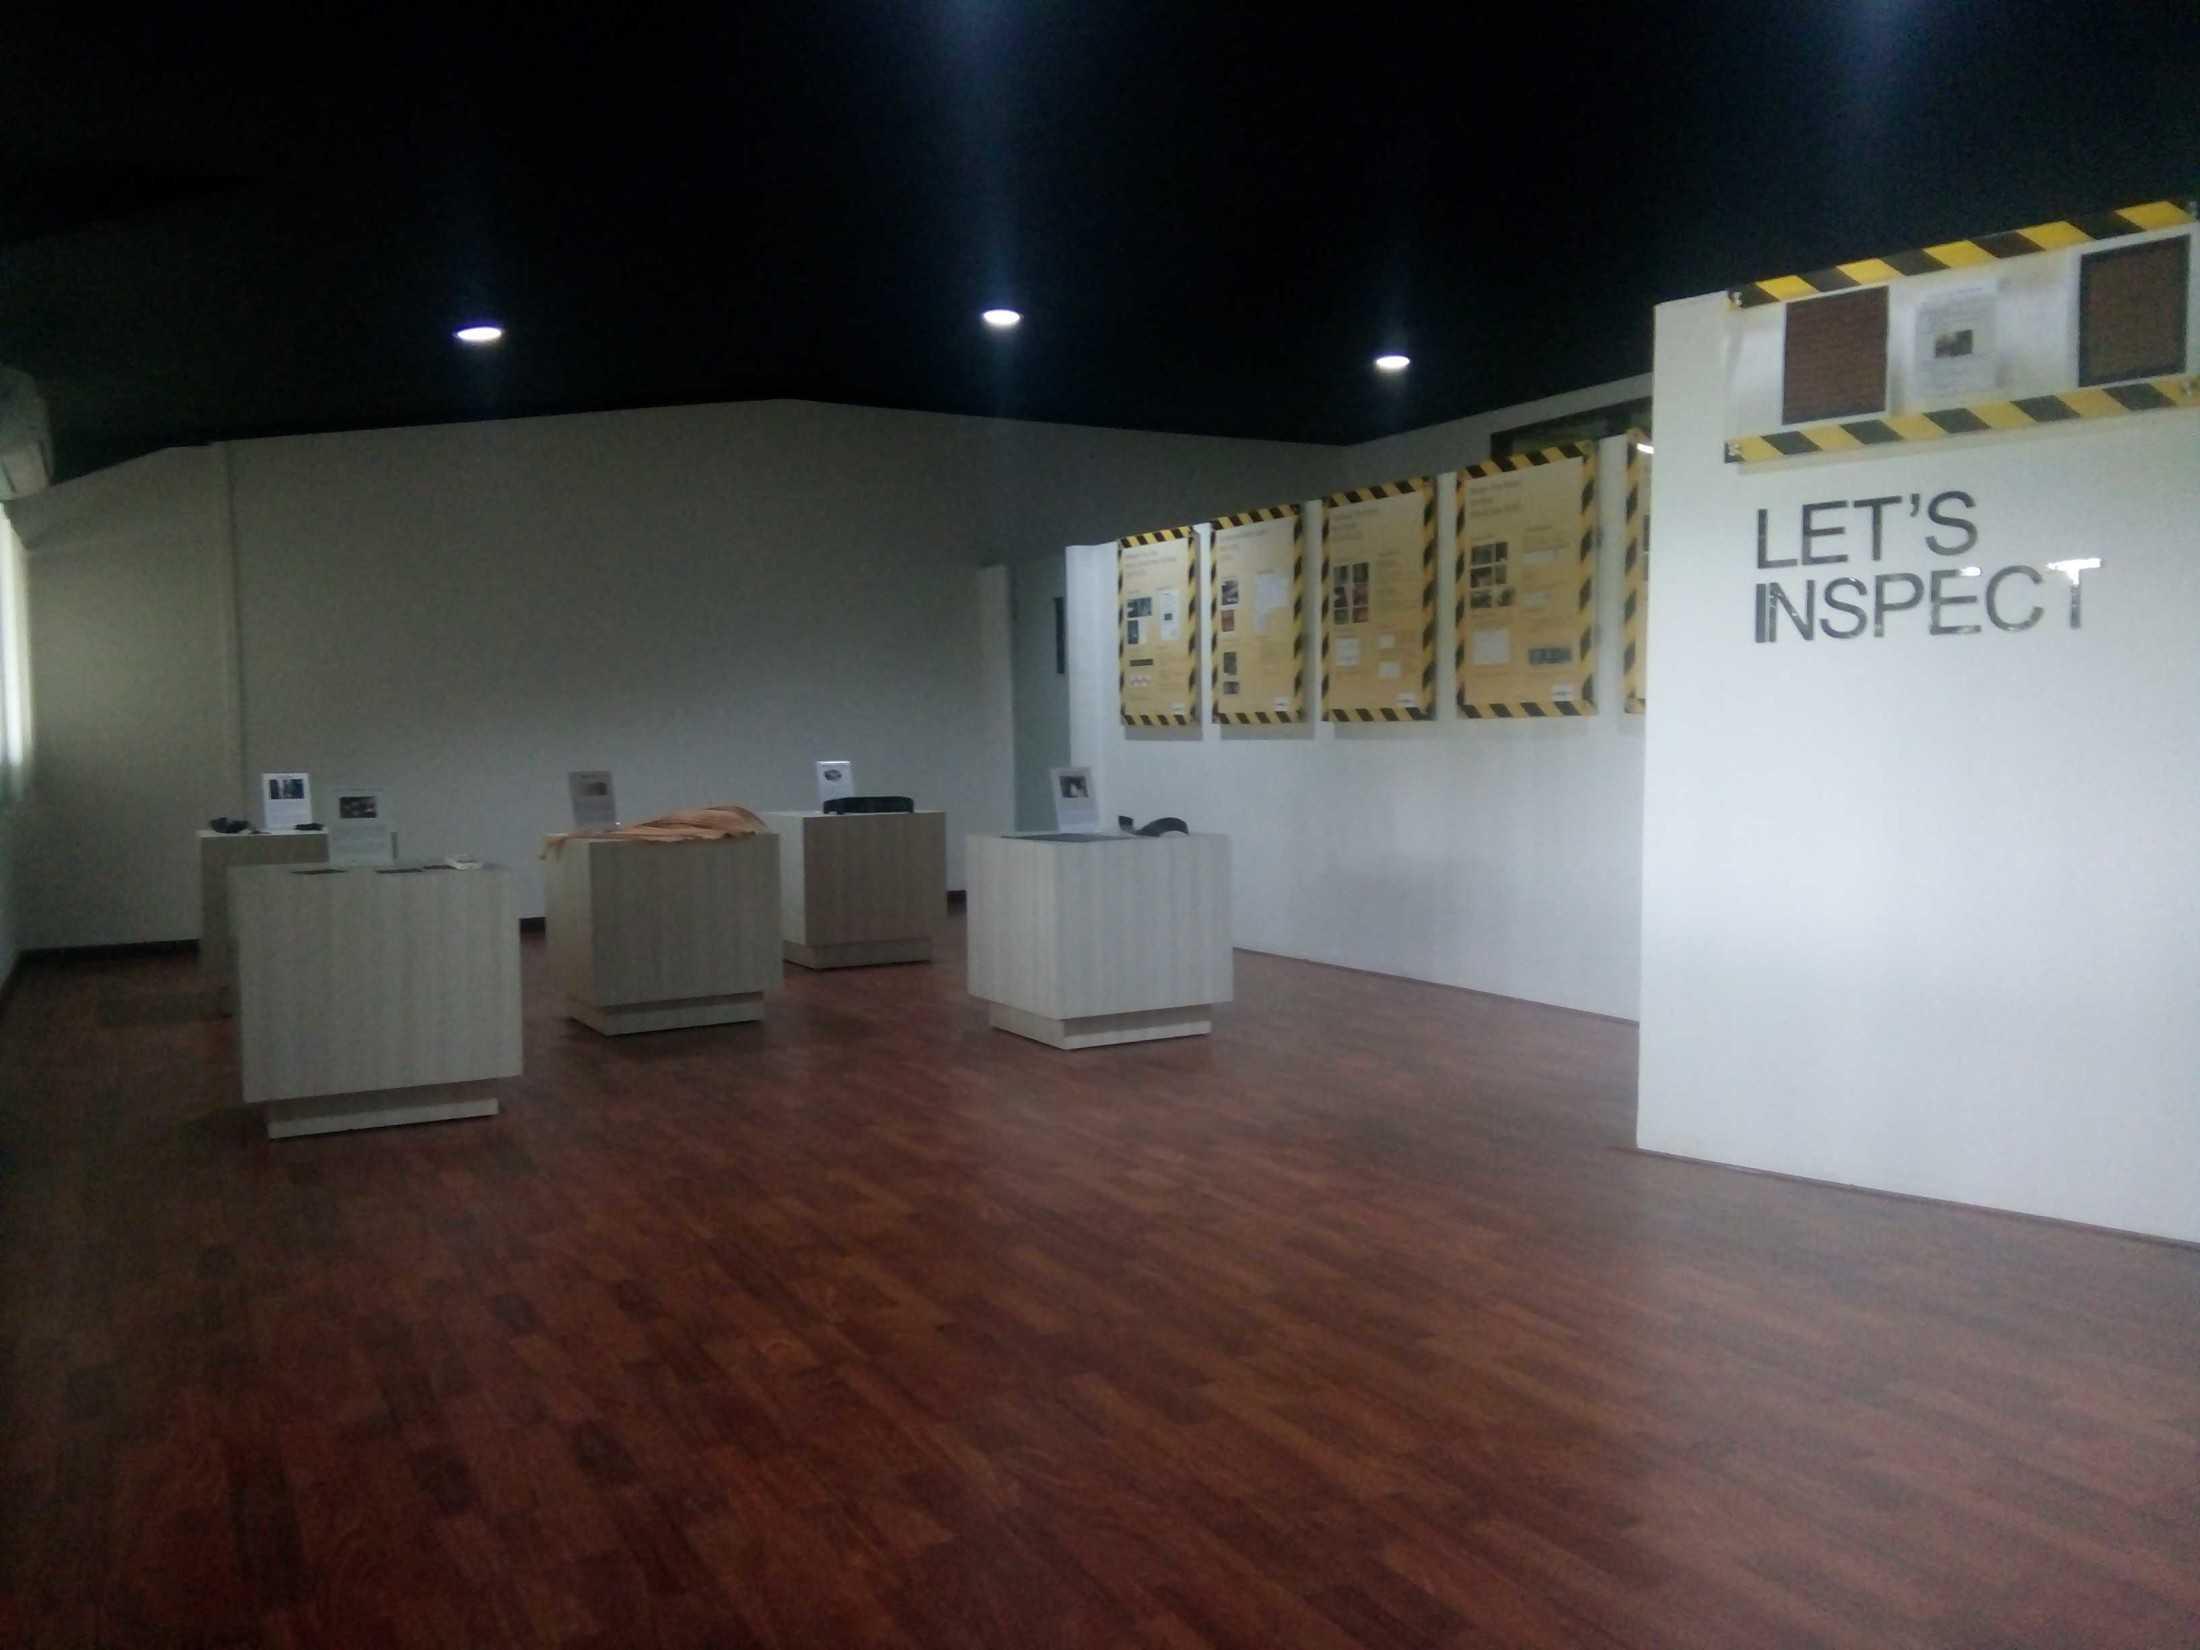 Ddm Project Interior Display Quality Room Cibinong, Bogor, Jawa Barat, Indonesia Cibinong, Bogor, Jawa Barat, Indonesia Ddm-Project-Interior-Display-Quality-Room  90812